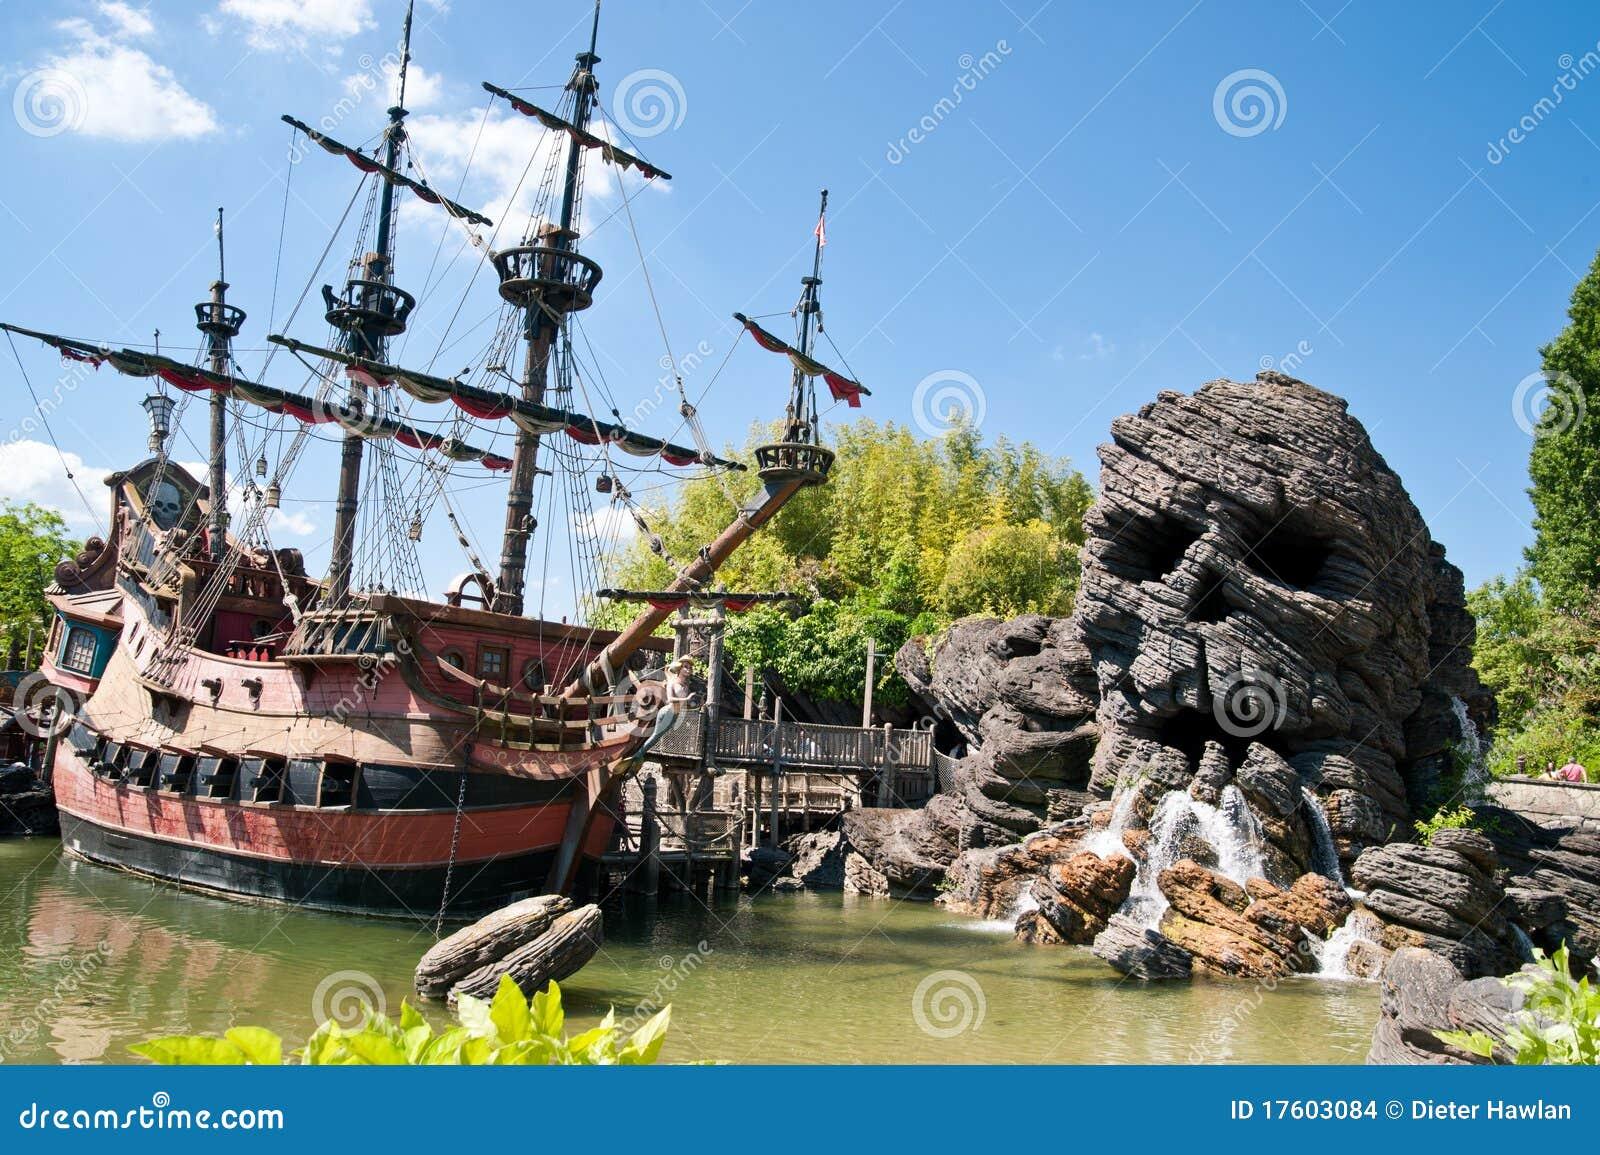 pirates de th me des cara bes image stock ditorial image 17603084. Black Bedroom Furniture Sets. Home Design Ideas